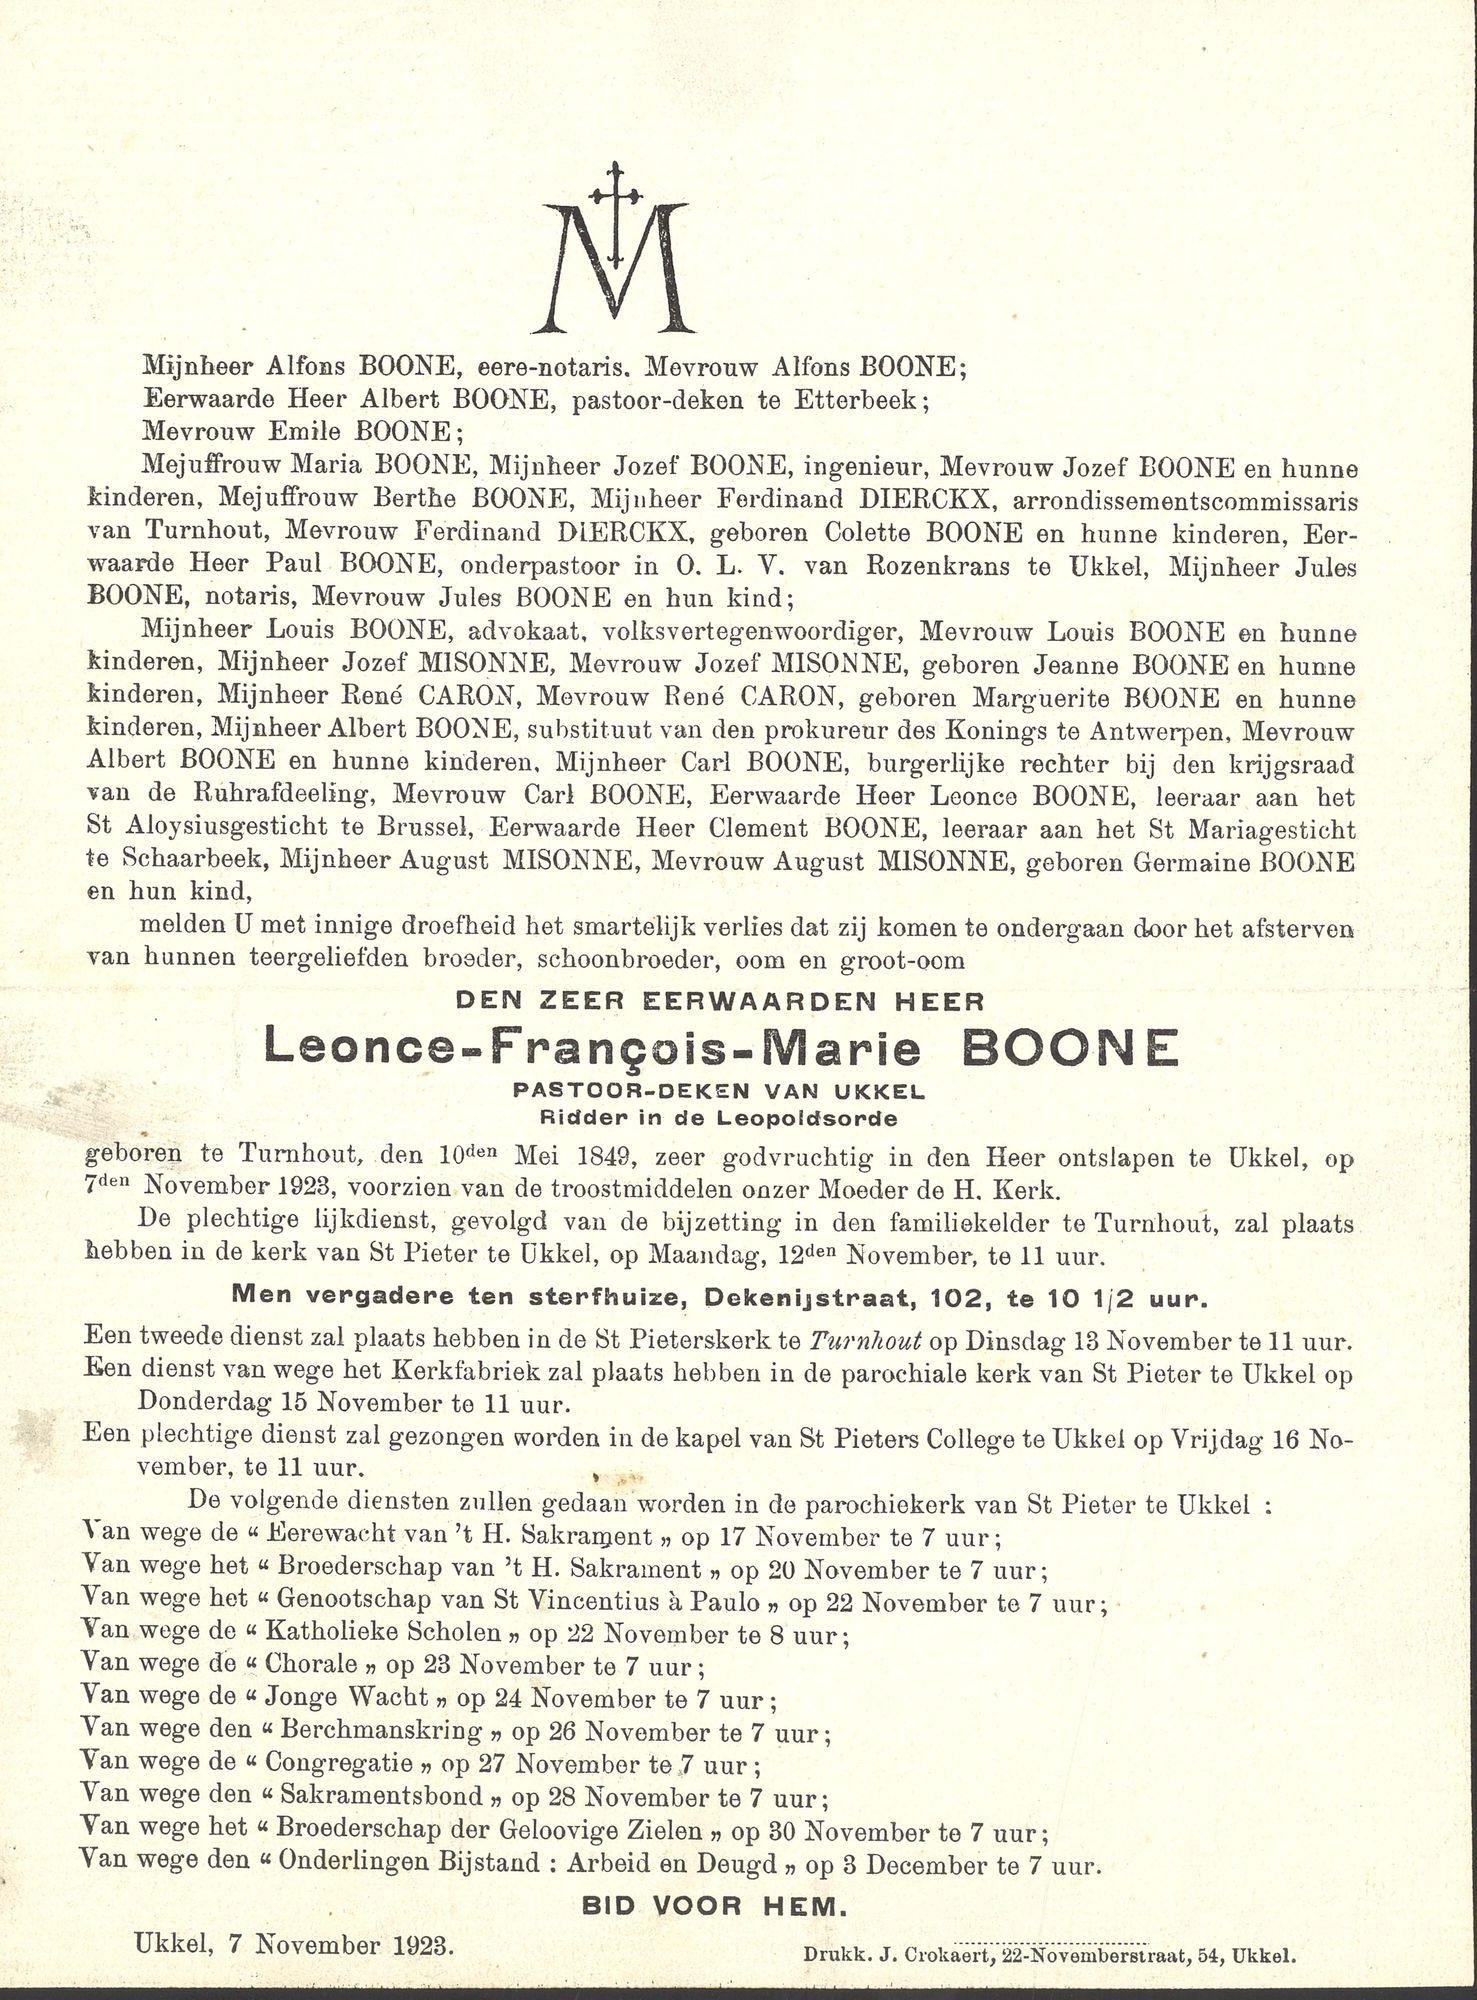 Leonce-François-Marie Boone